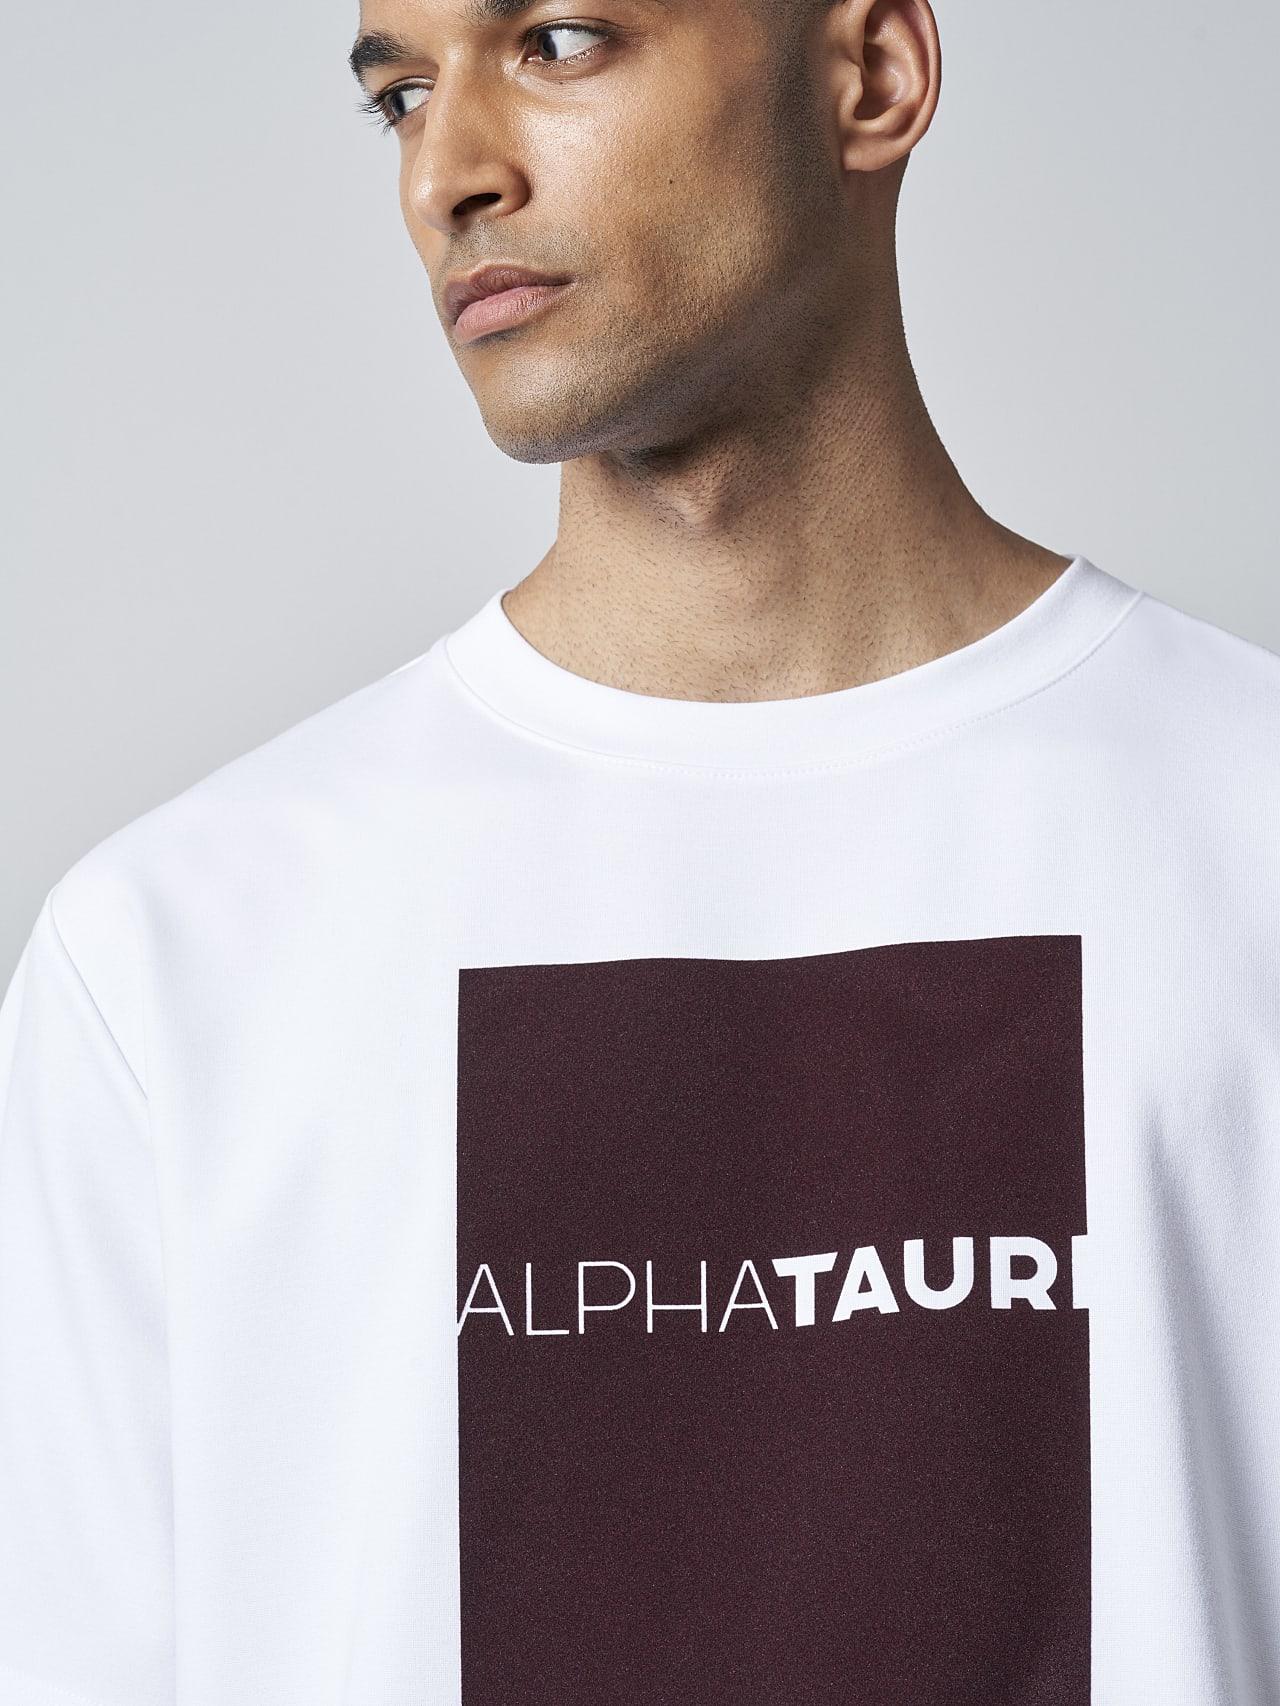 JAHEV V1.Y5.02 Relaxed Logo T-Shirt white Model shot Alpha Tauri